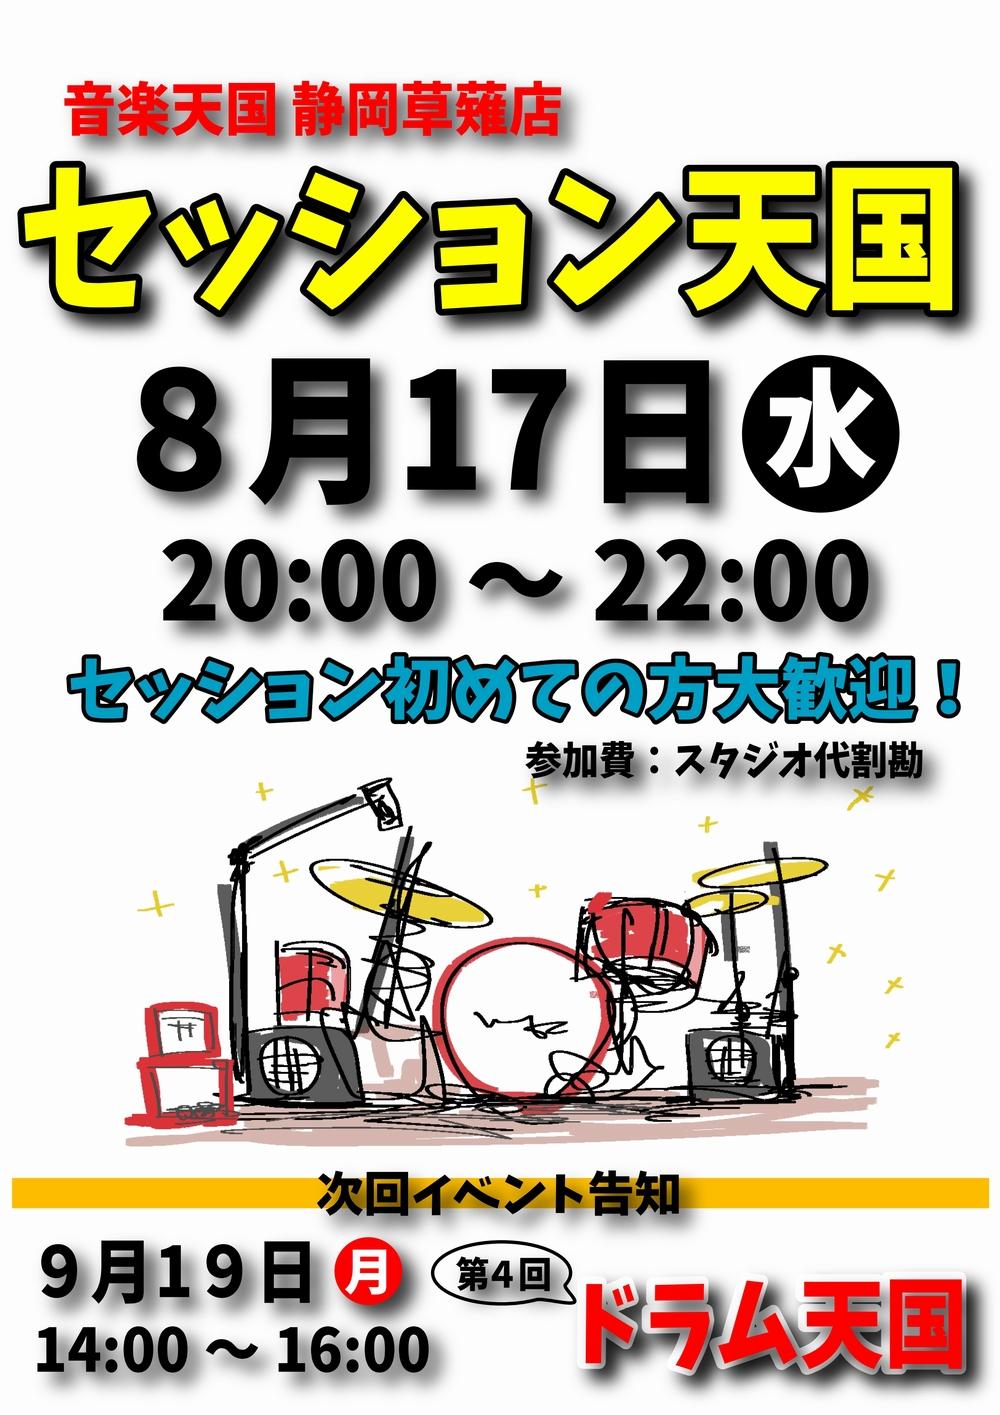 【セッション天国】音楽天国・静岡草薙店8月17日(水)開催